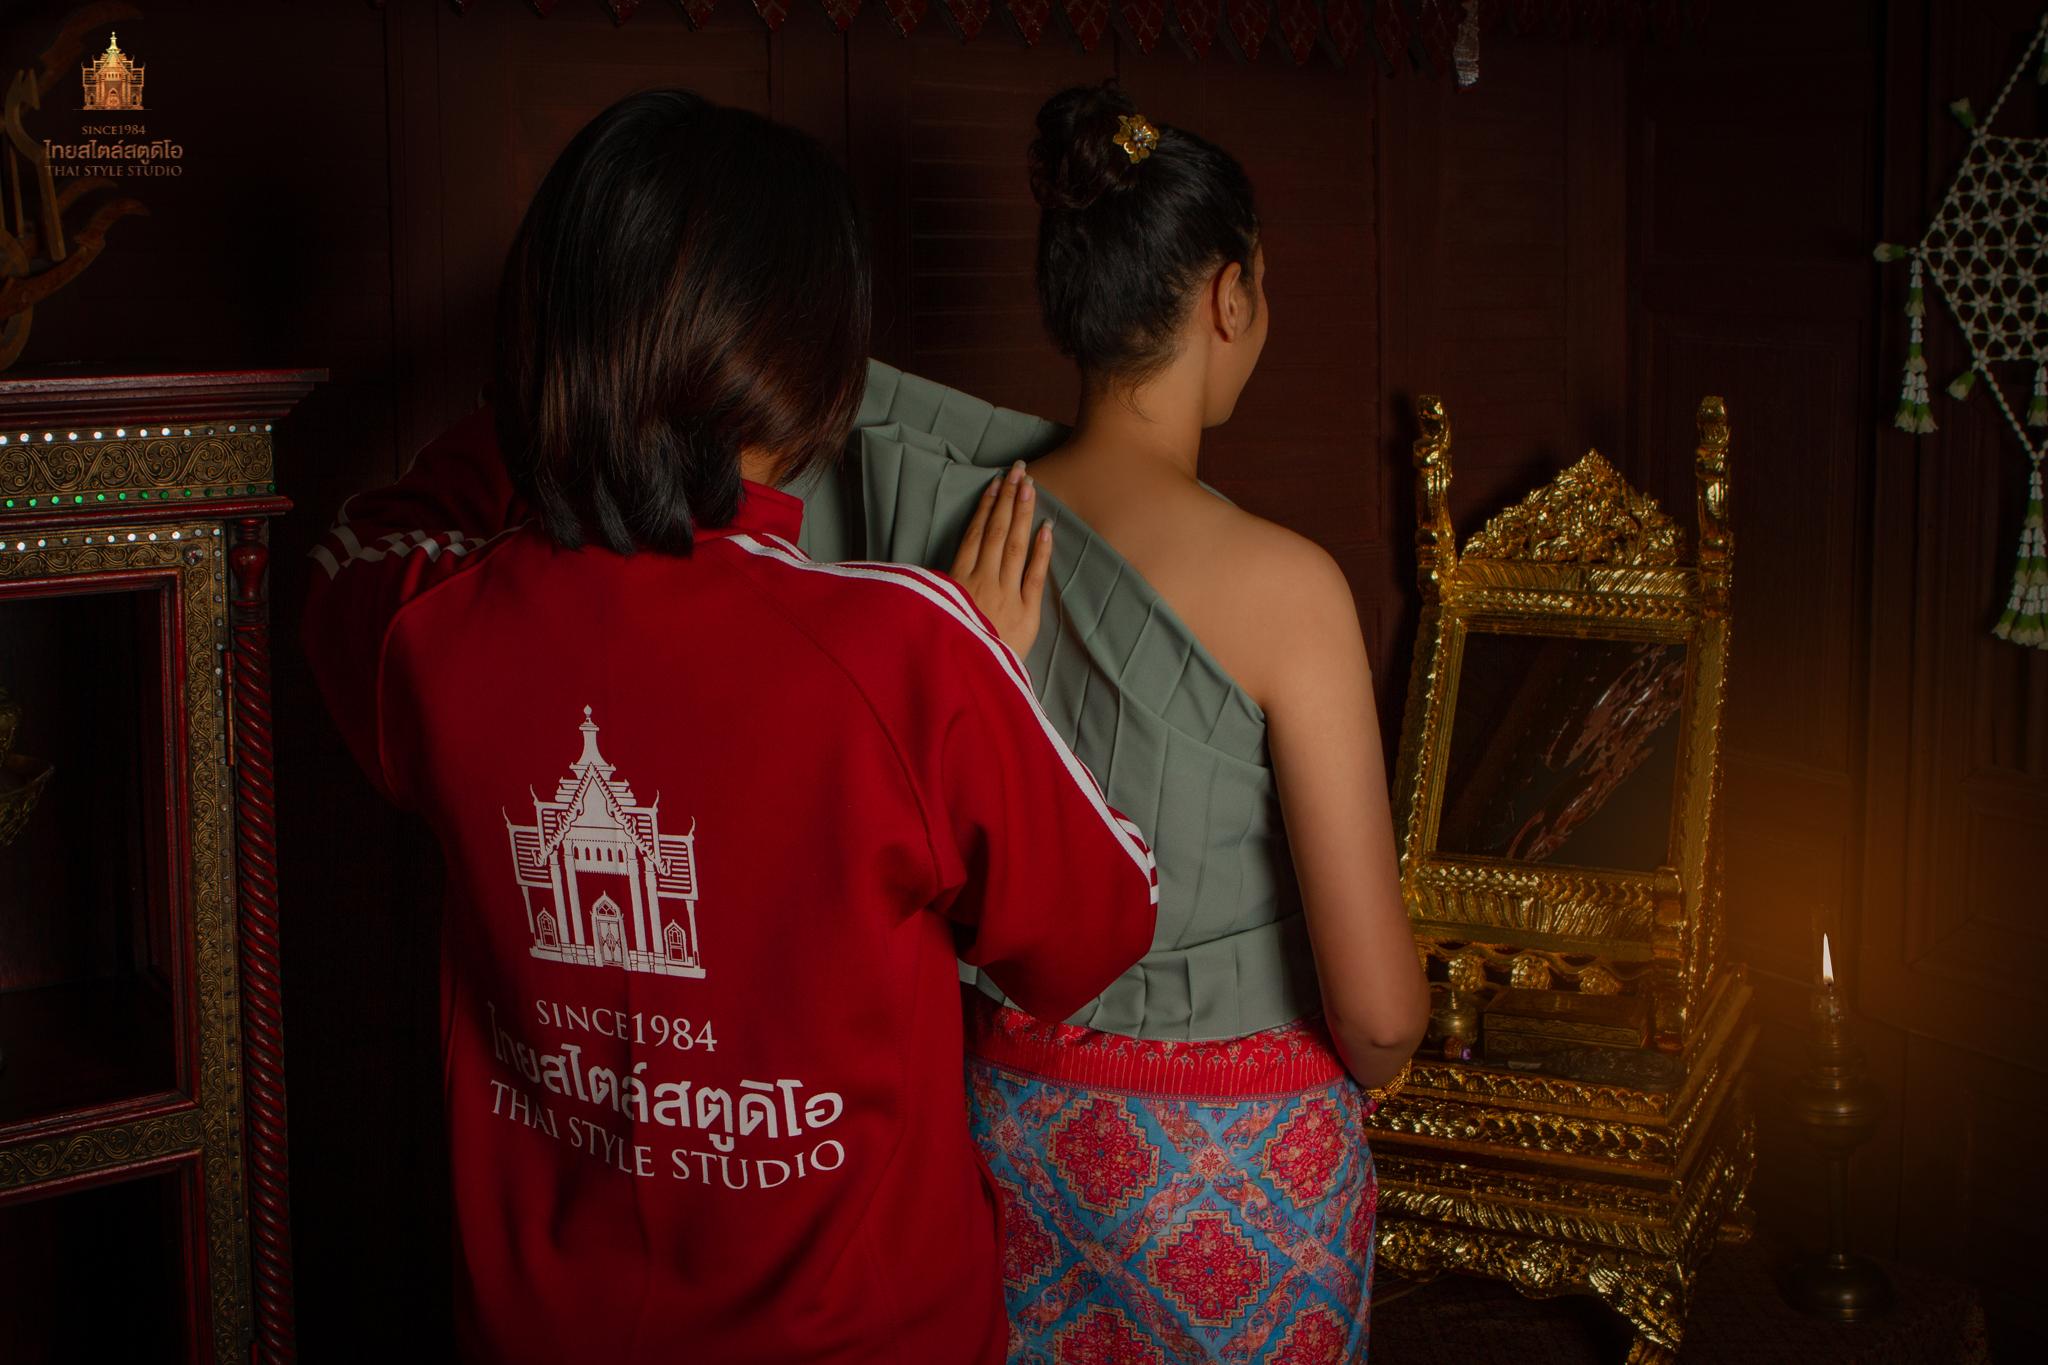 Thai Style Studio 1984 การห่มสไบจีบชั้นเดียว 9